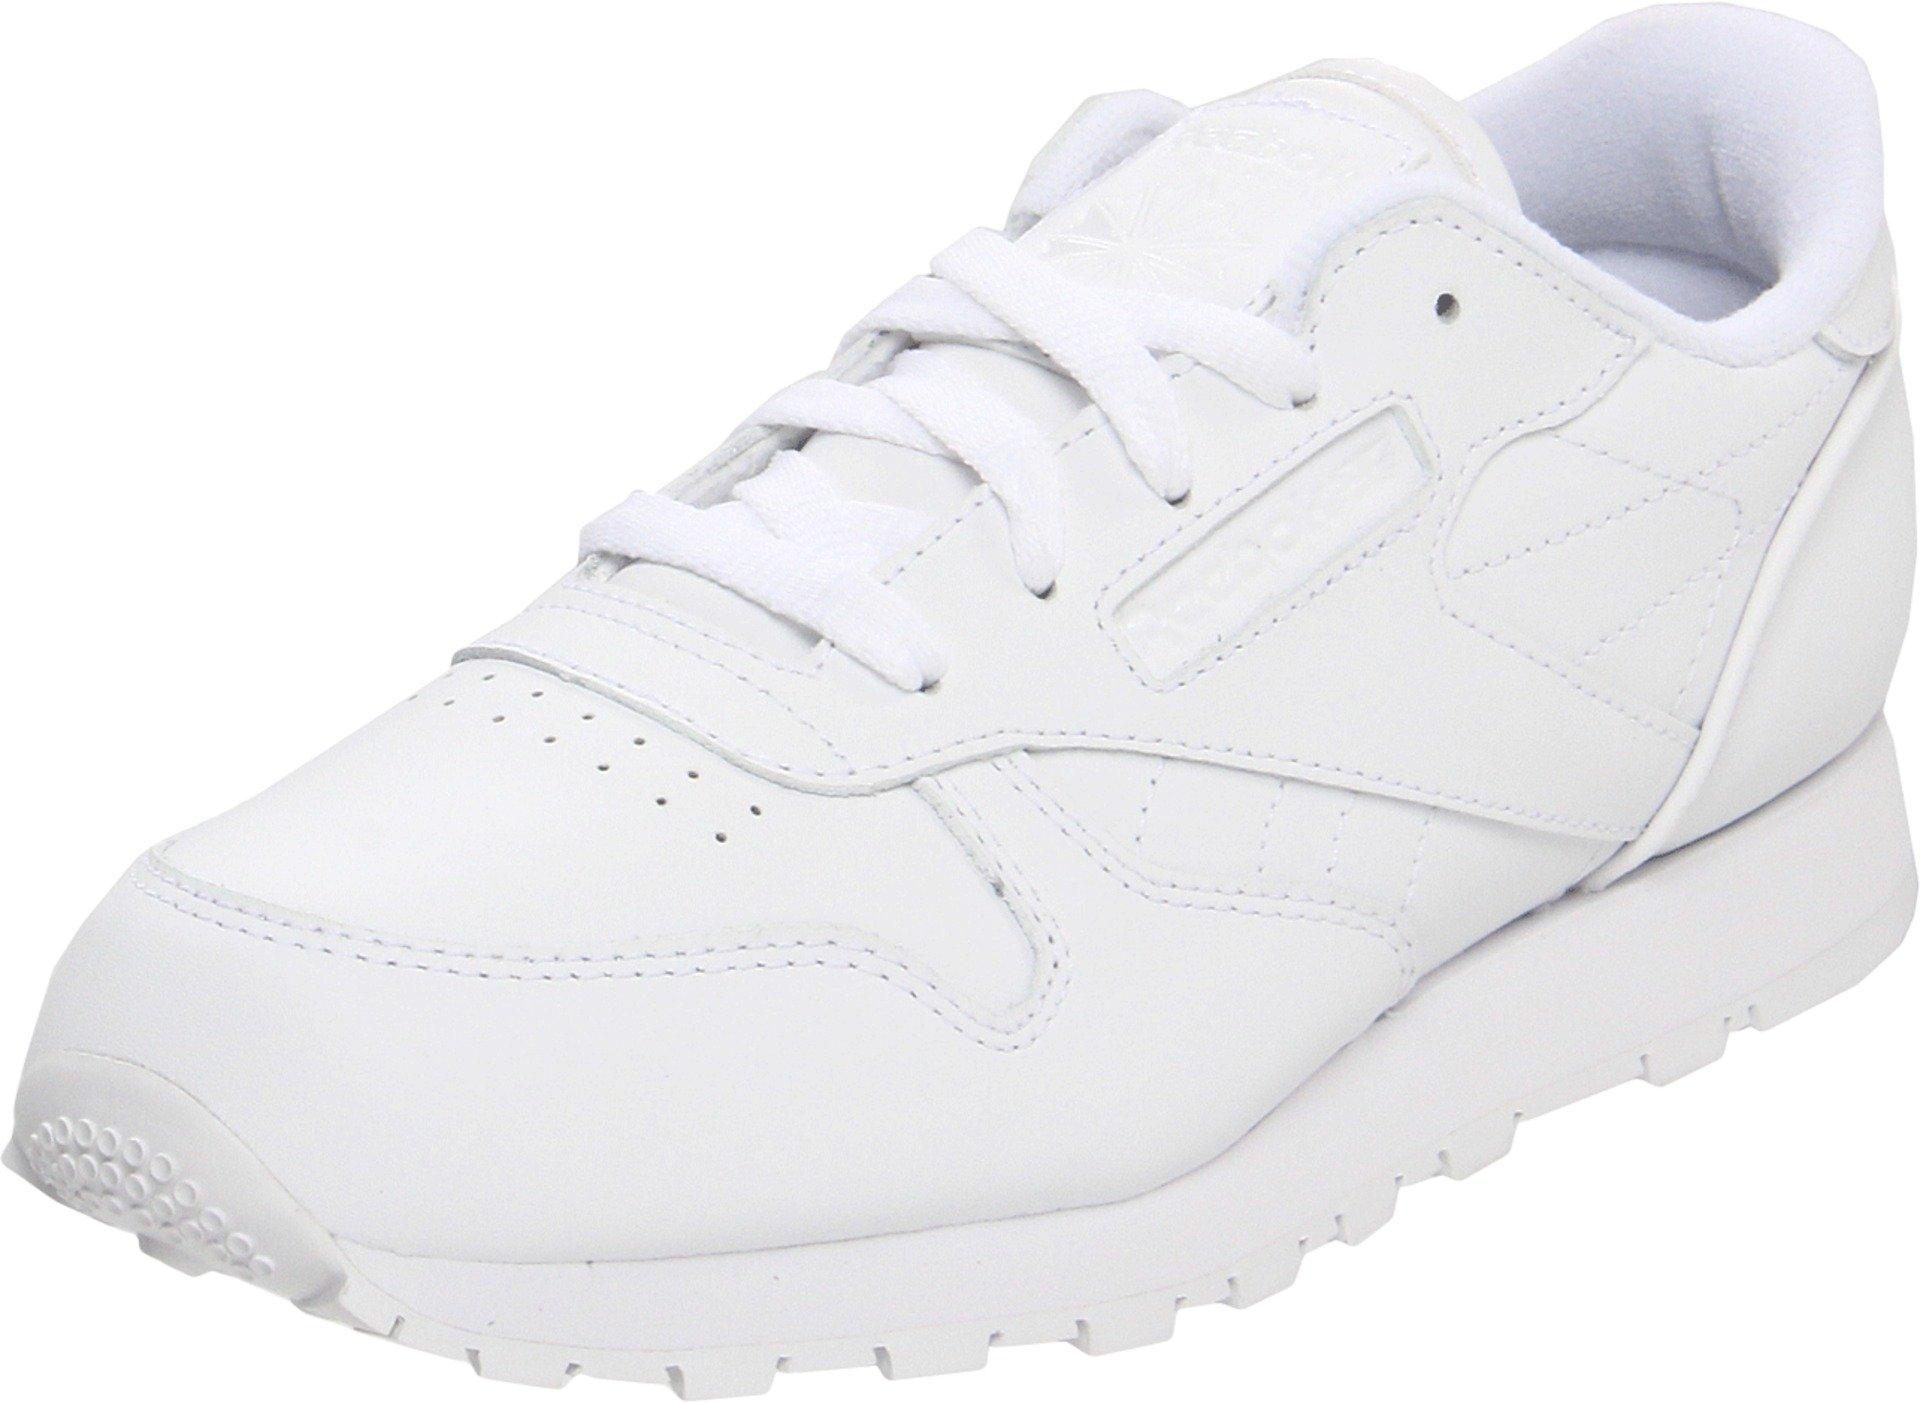 Reebok Classic Leather-K, White, 7 M US Big Kid